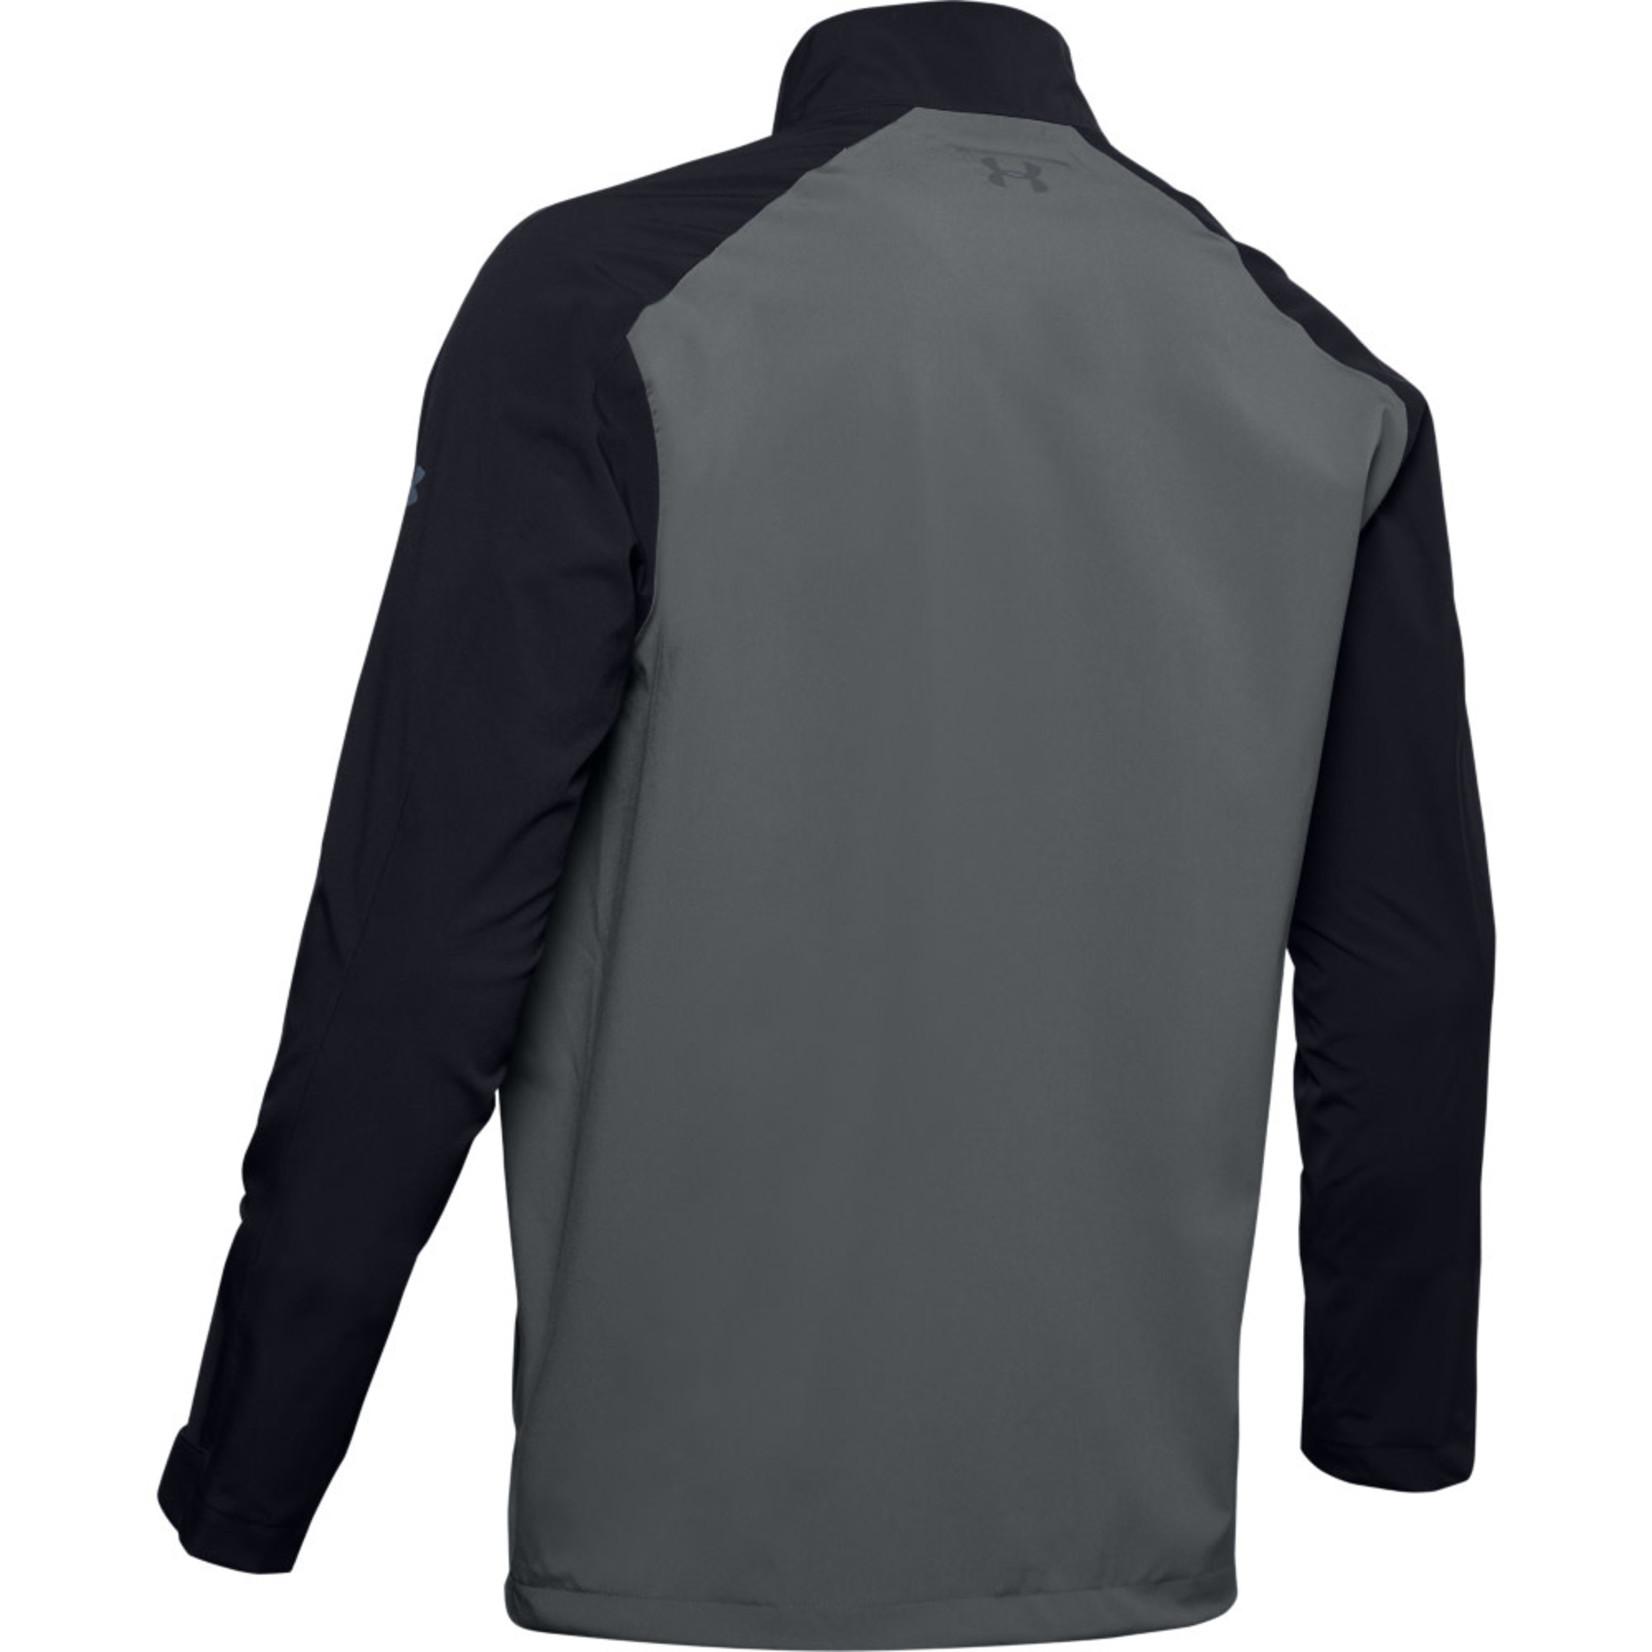 Under Armour Under Armour Elements Rain Jacket (MENS) Black/Grey